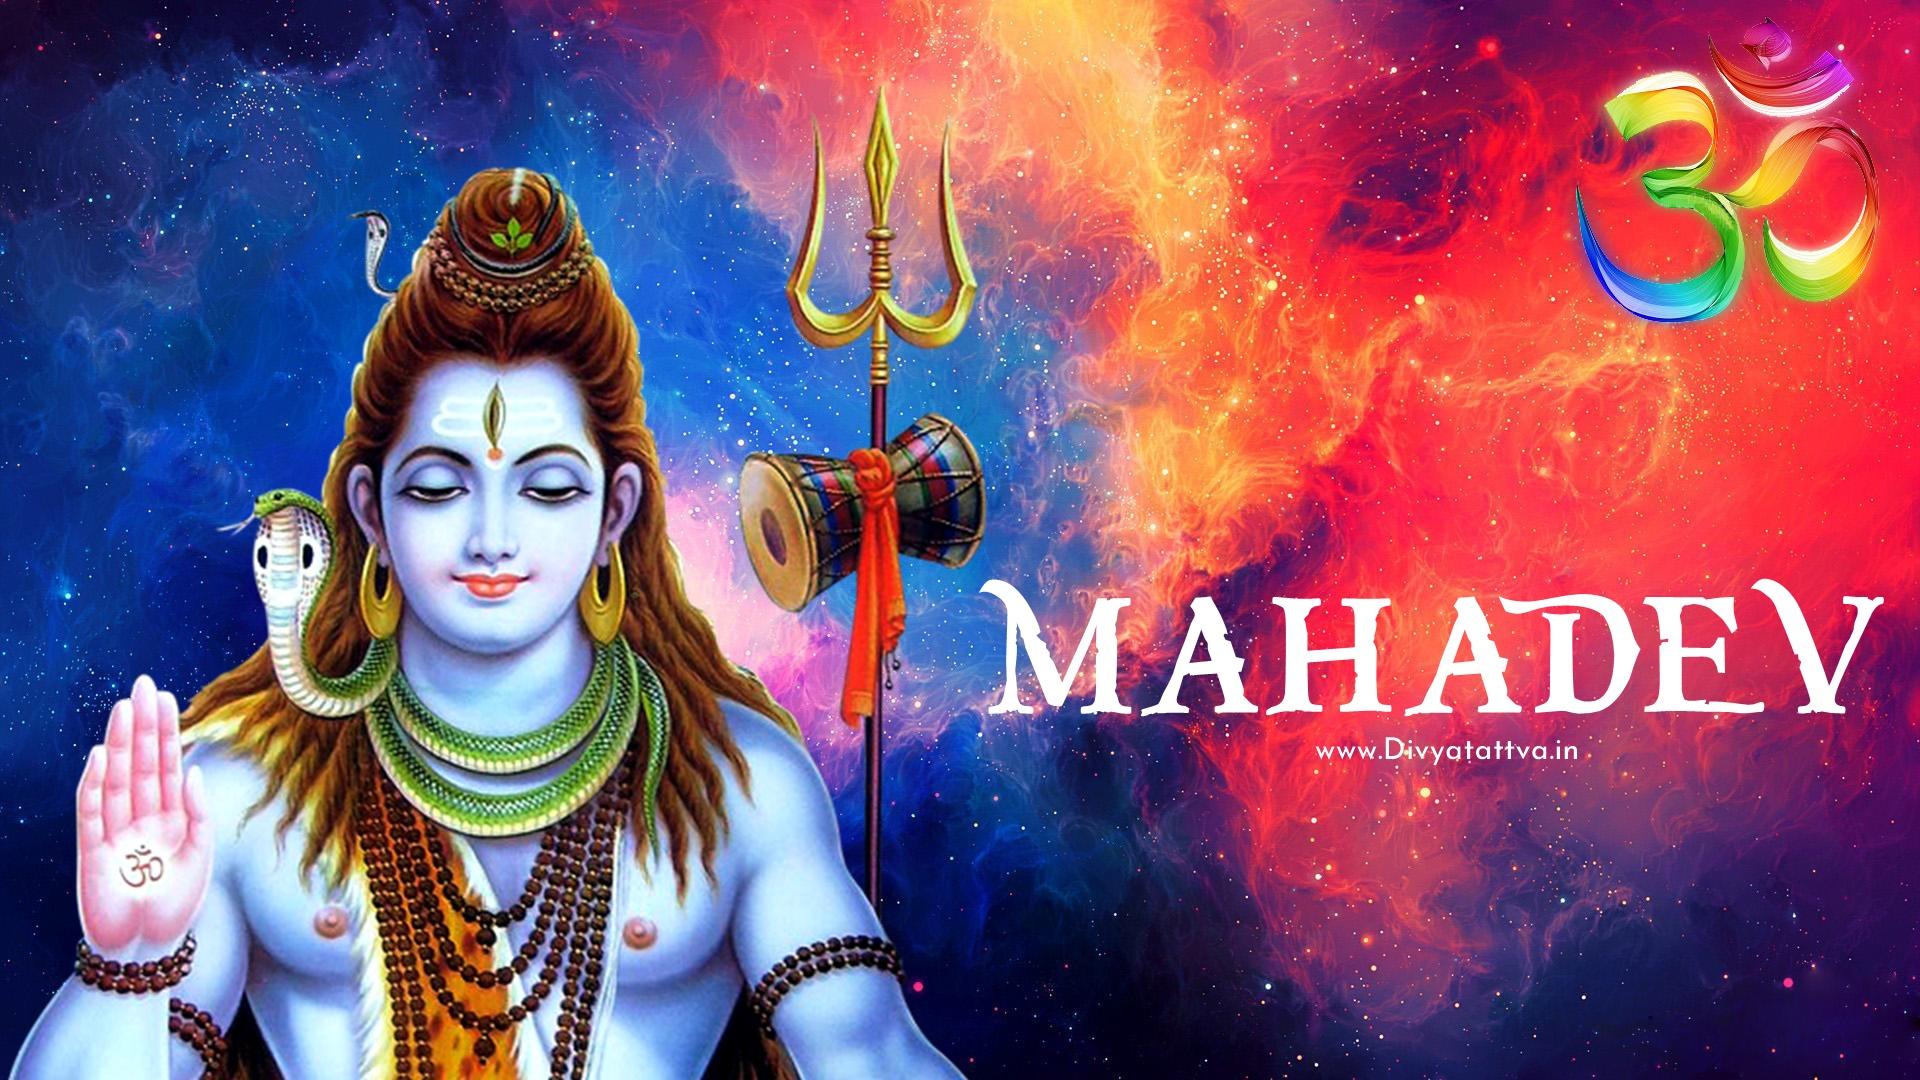 Shiva, Mahadev, Shiva 3D, Shiva Parvati wallpaper, Hindu Gods Backgrounds Clipart, Indian God Photos for smartphones